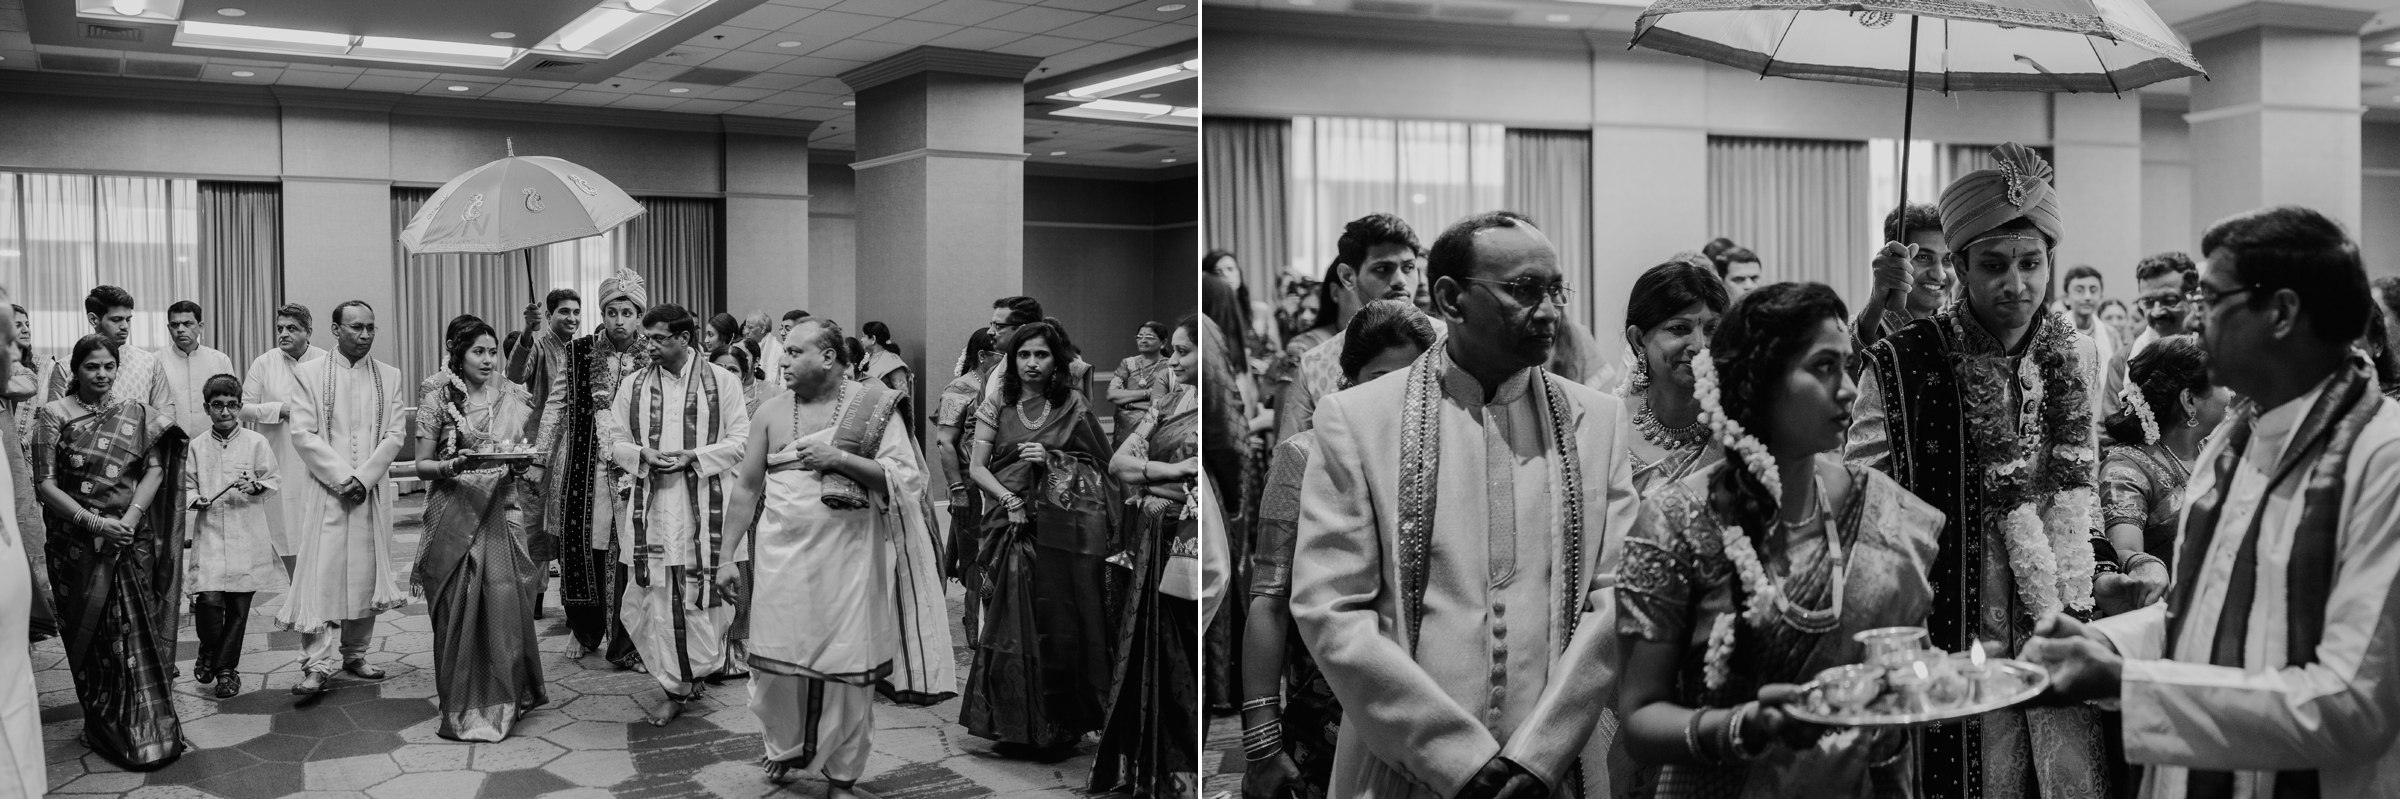 indian wedding minneapolis minnesota texas austin wedding elopement destination intimate best photographer_0017.jpg